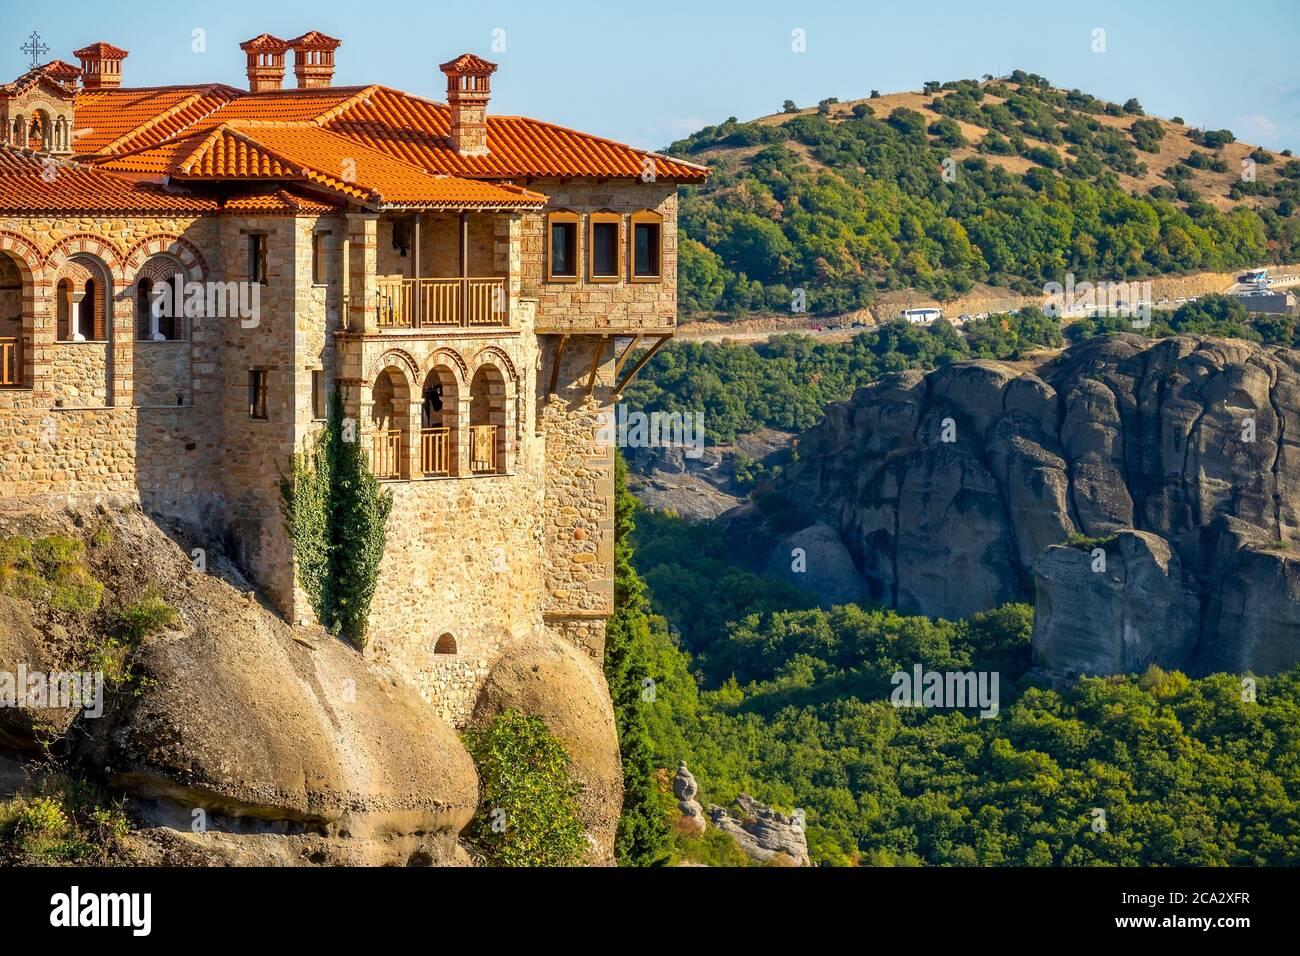 Greece. Summer sunny day in Kalambaka. Balconies of a Rock Monastery of Meteora. Stock Photo